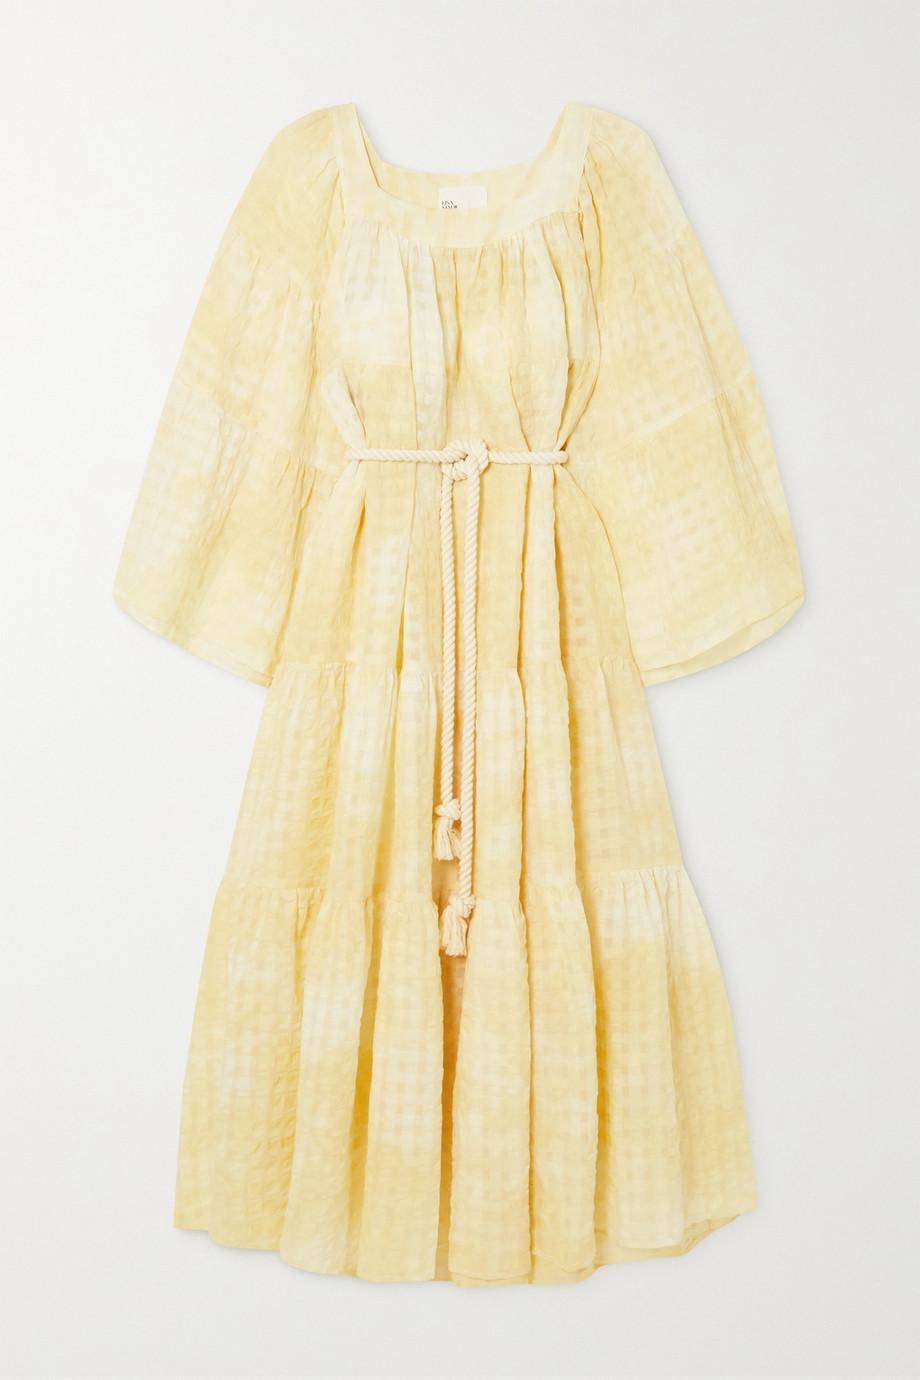 Lisa Marie Fernandez + NET SUSTAIN belted tie-dyed linen and cotton-blend seersucker maxi dress